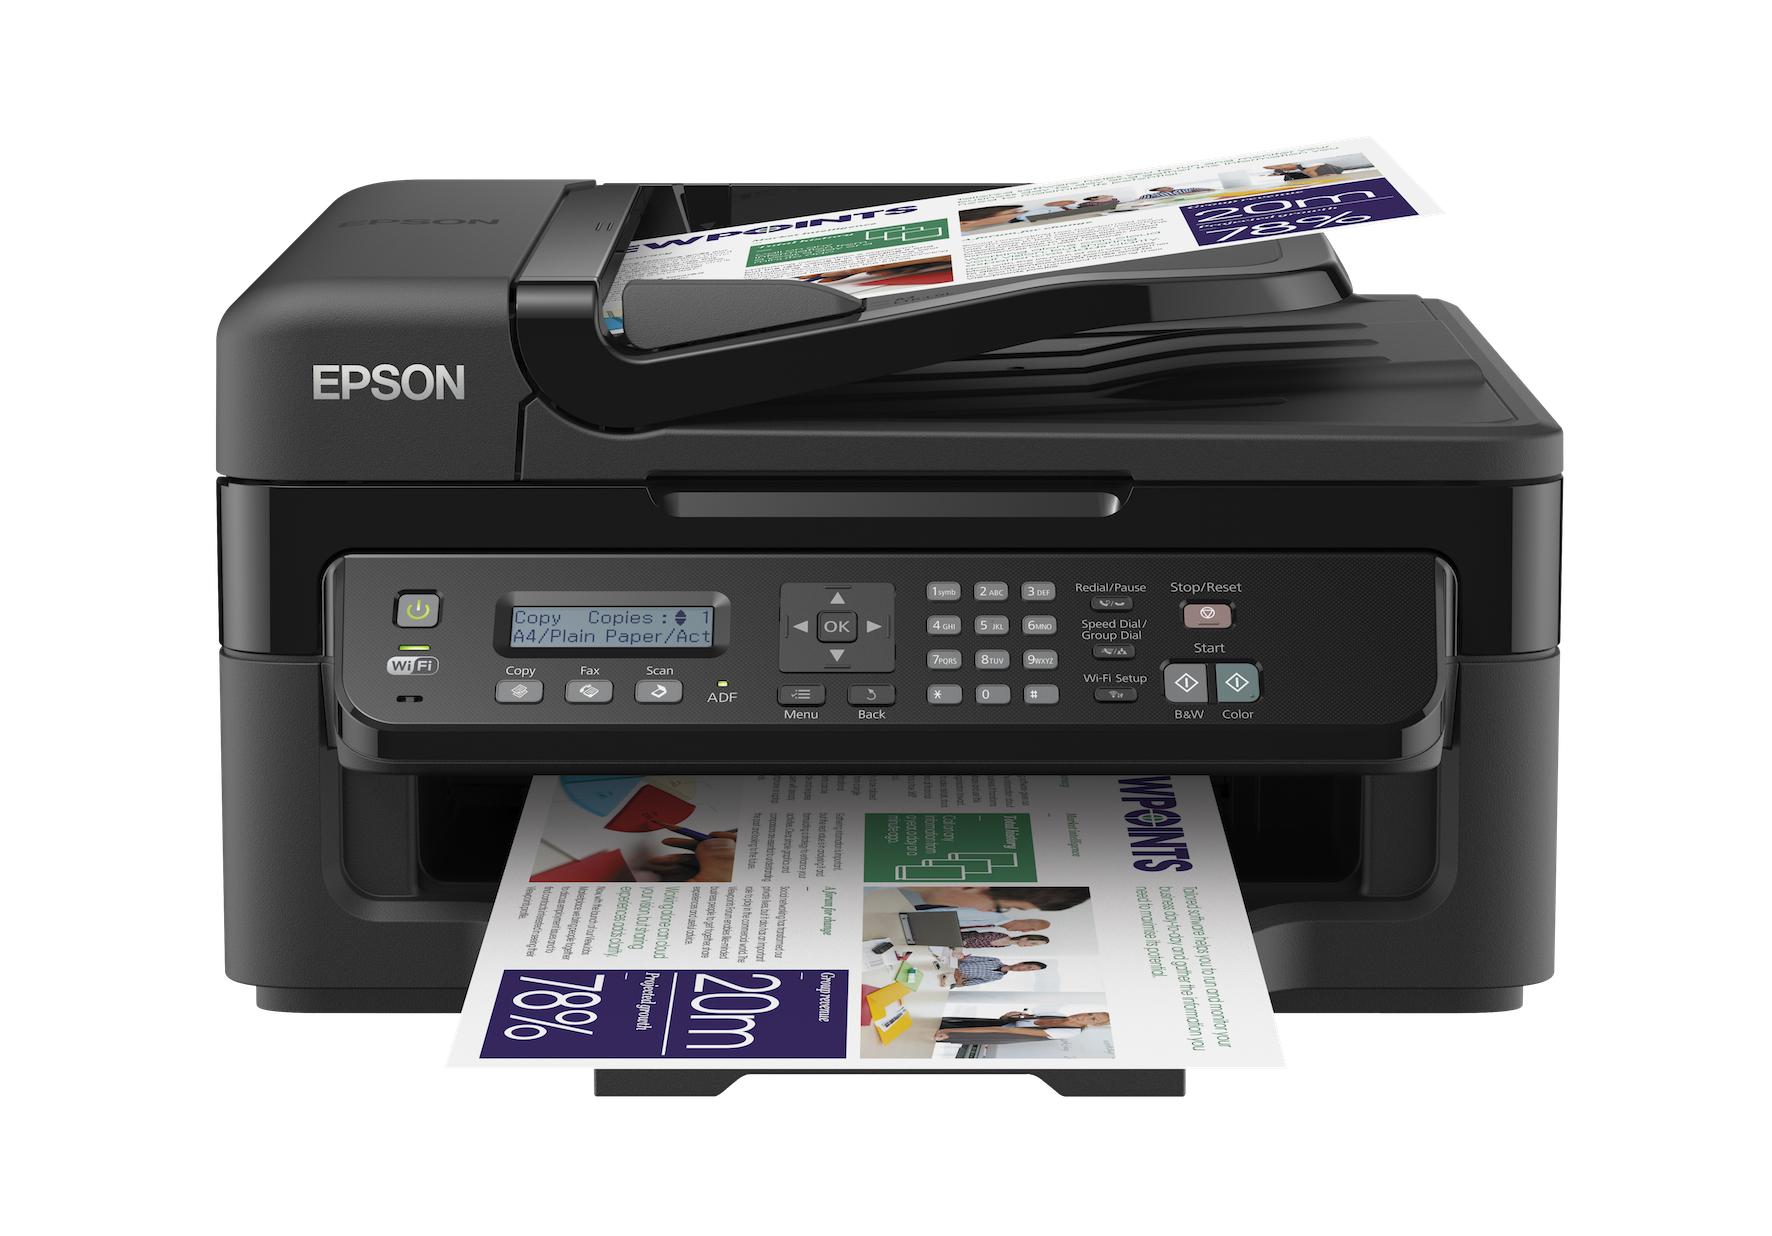 Epson_WorkForce_WF_2520nf